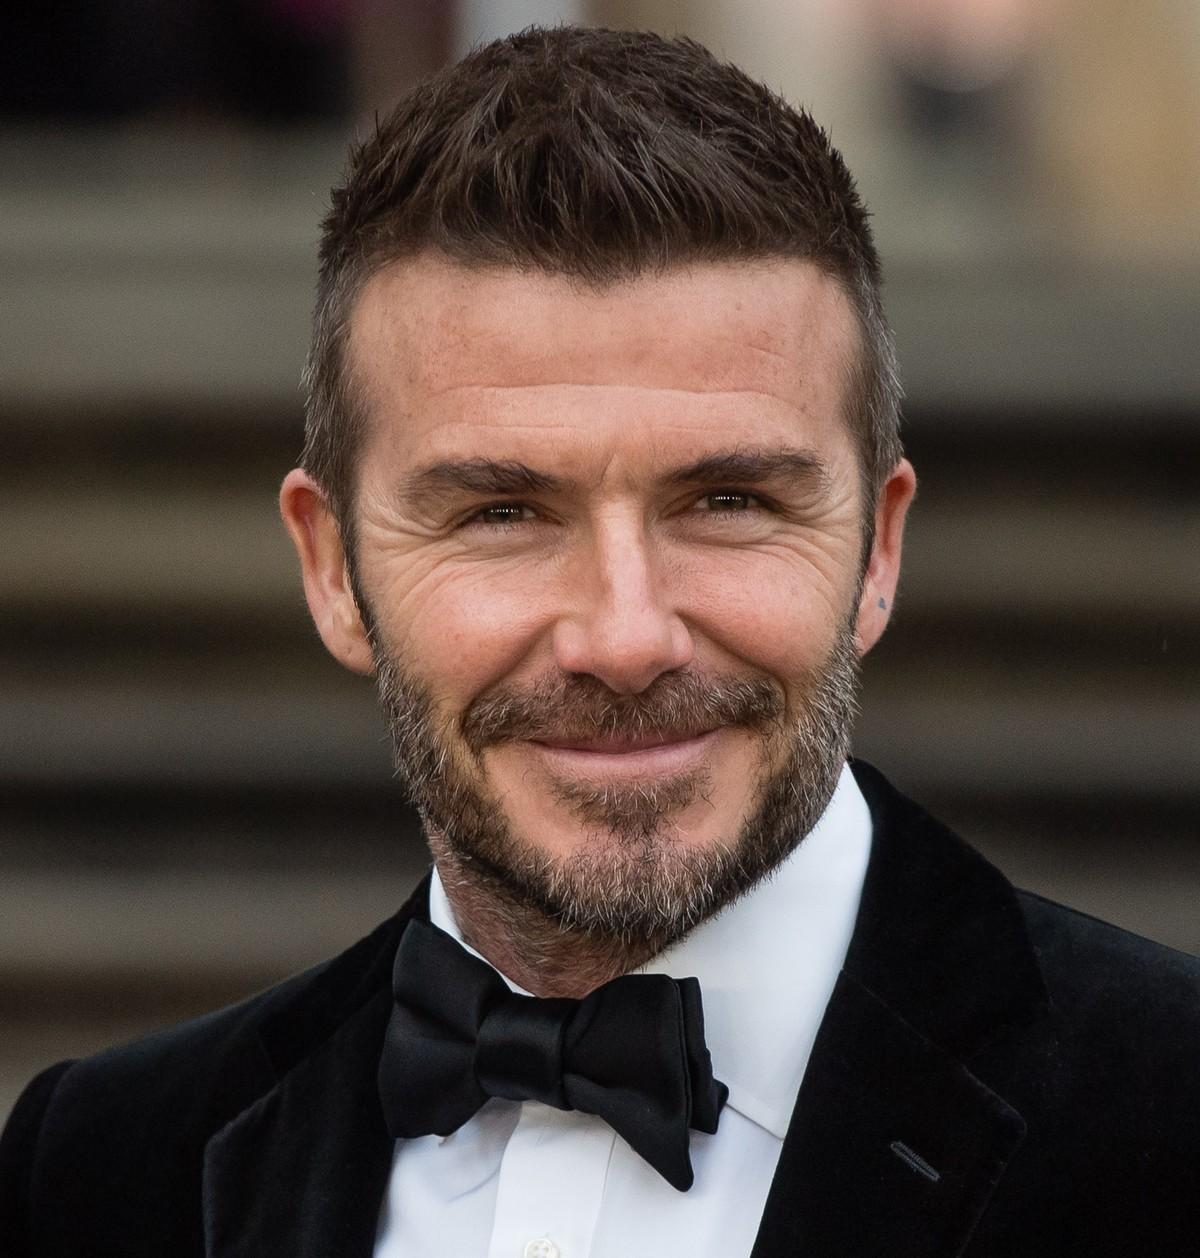 David Beckham: 88.96 Percent Accurate